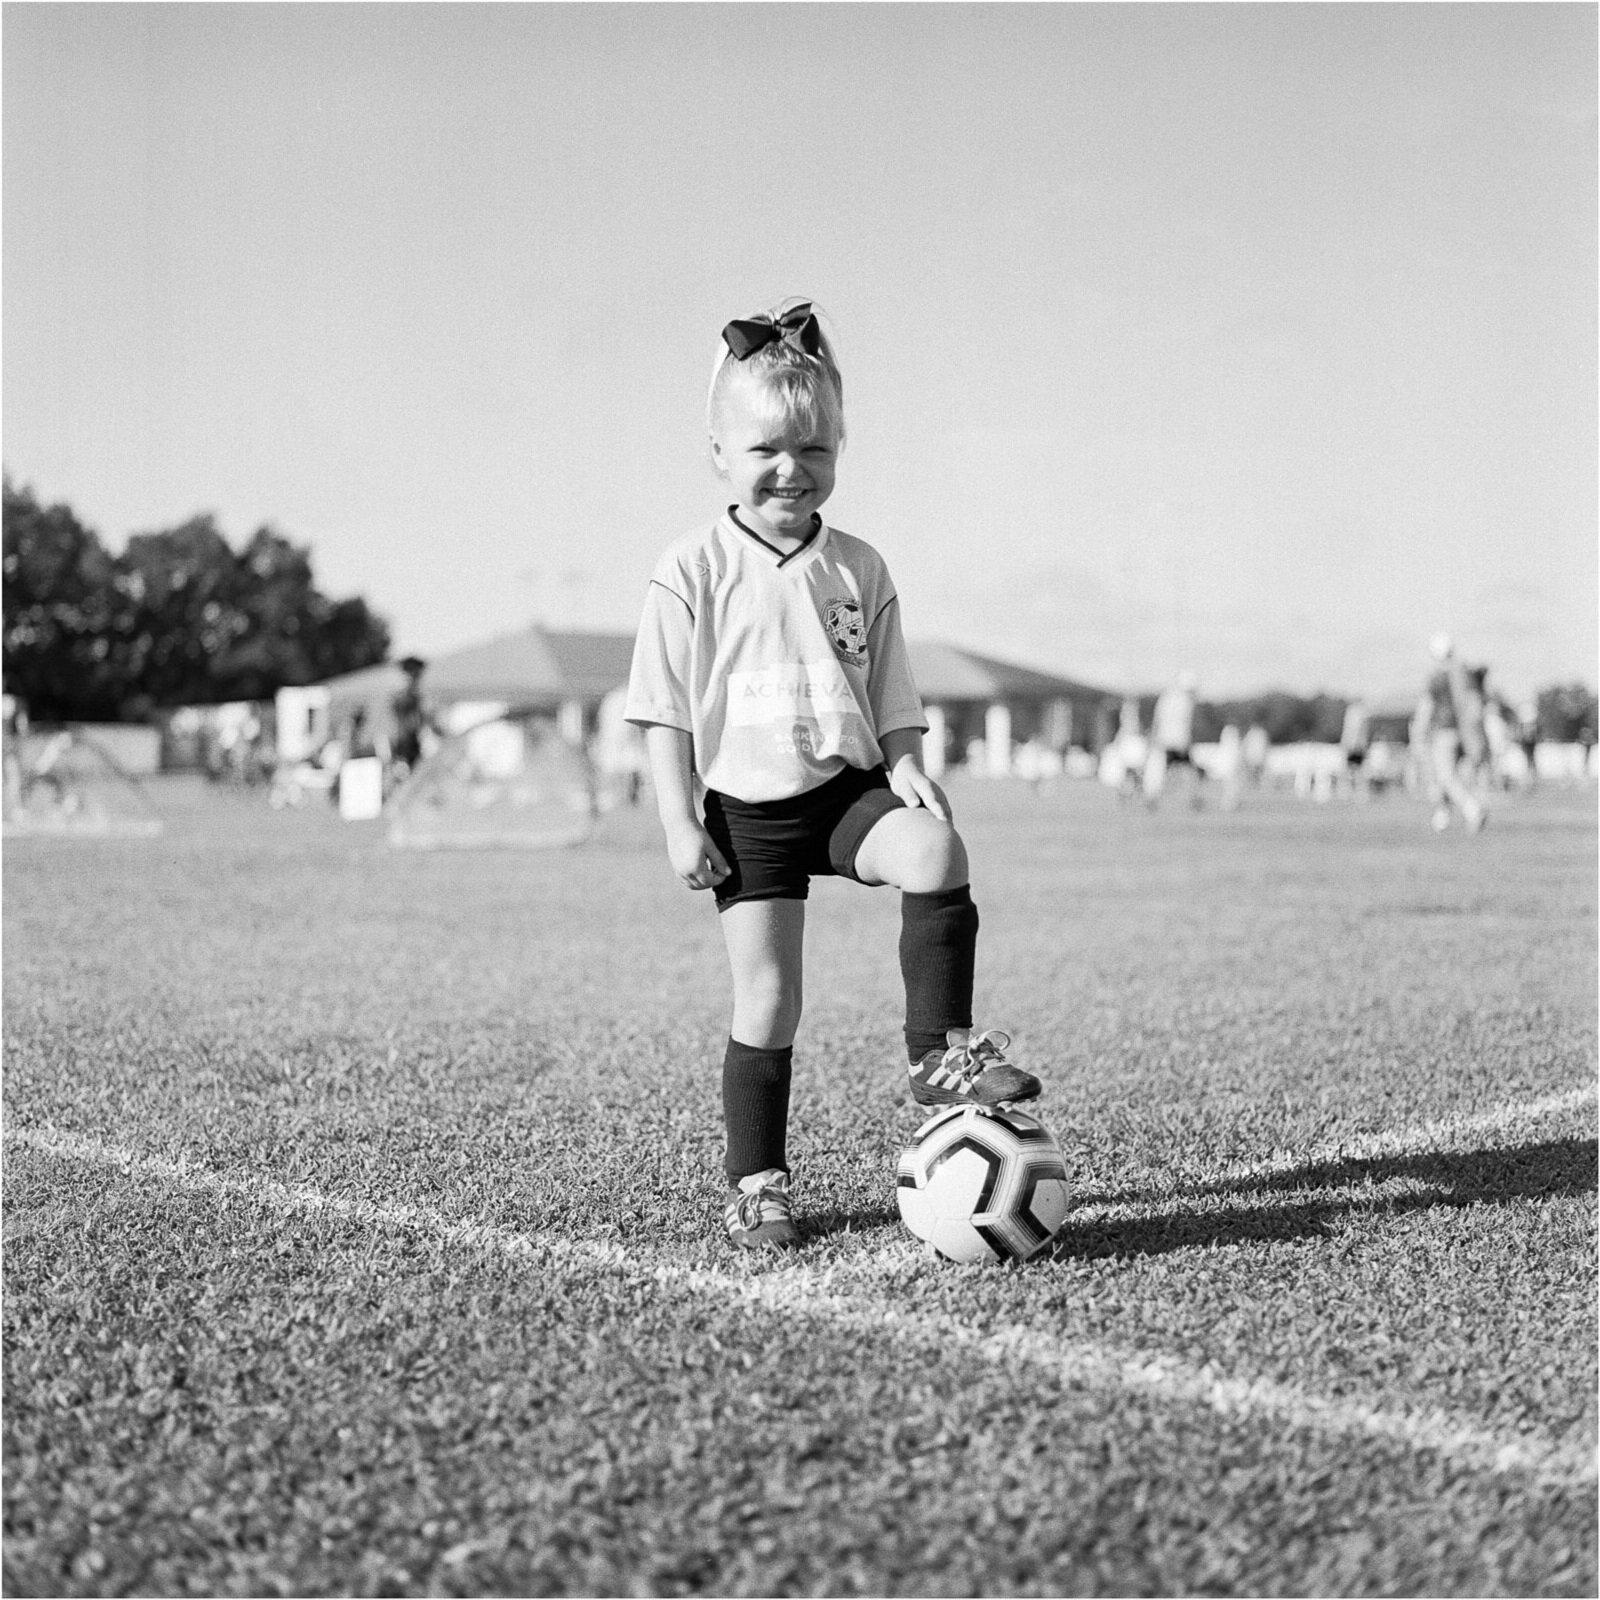 Chloe-Soccer-120-5-Edit-2.jpg